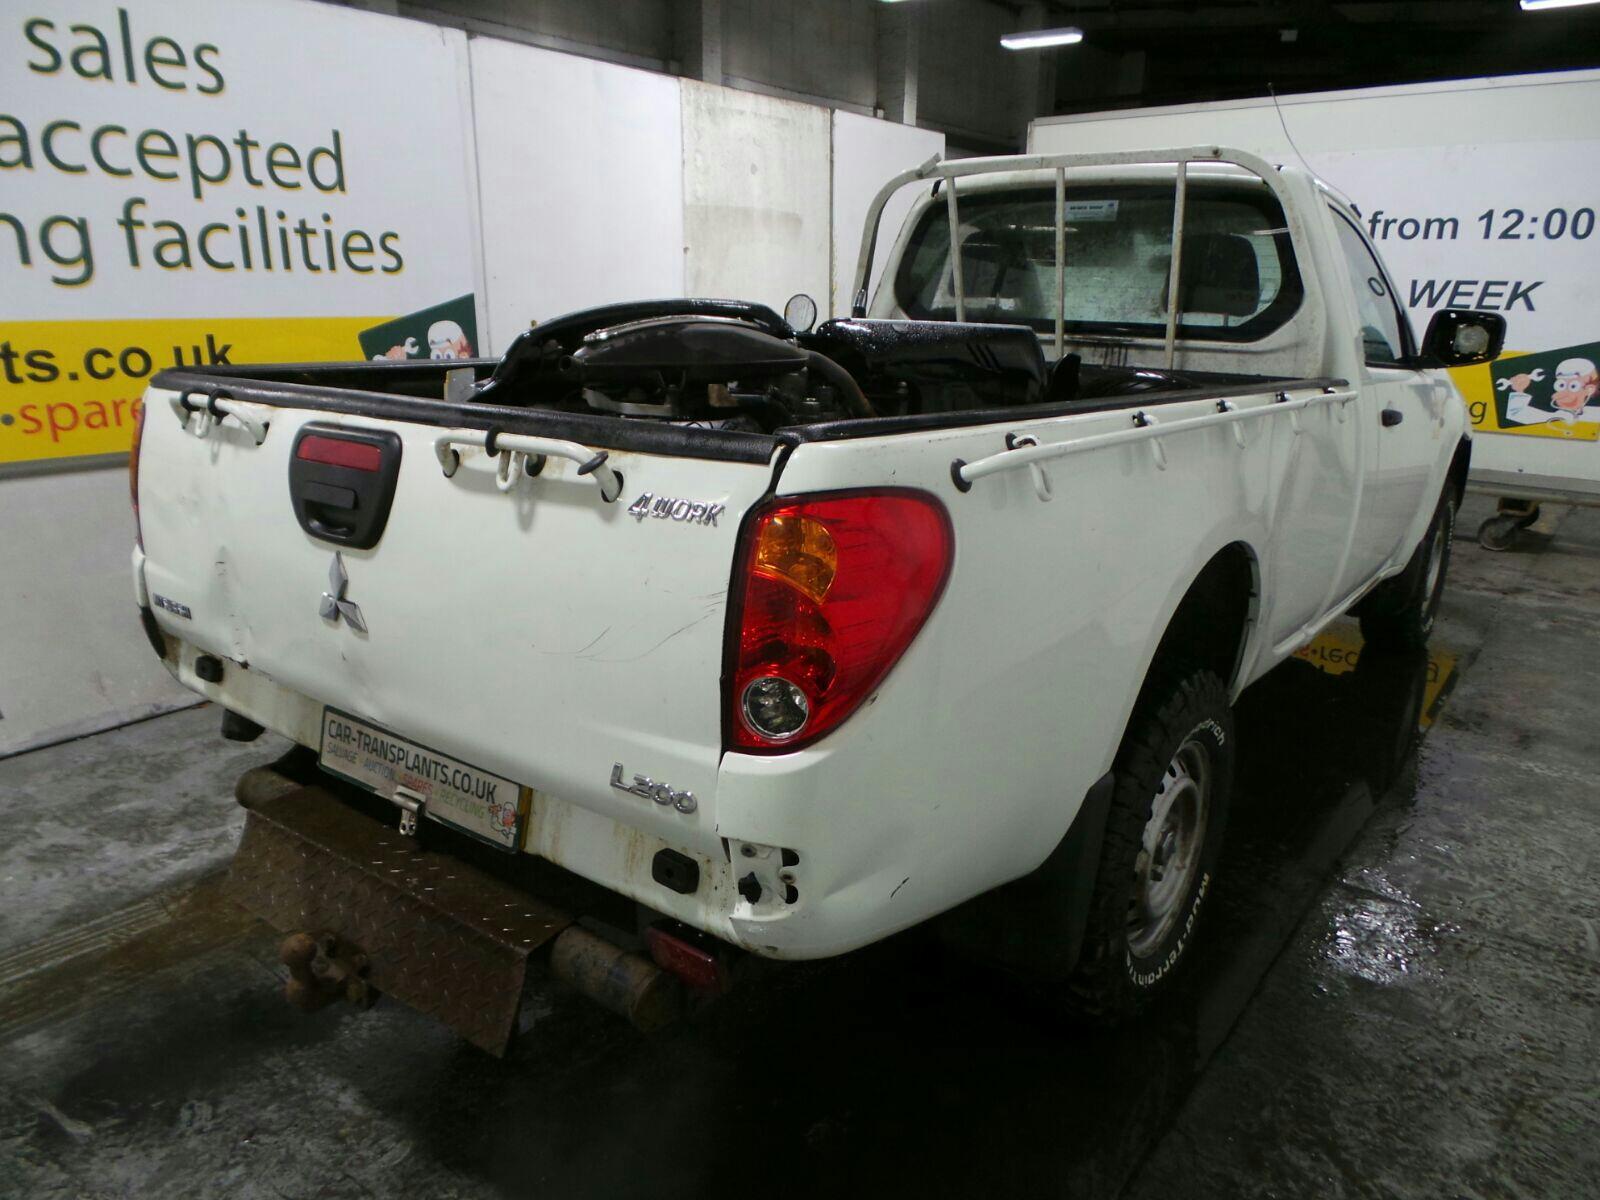 hight resolution of 2014 mitsubishi l200 4work single cab di d 4wd 2477cc rear end parts diesel manual 5 speed pick up at car transplants ltd road three due to close sun 2nd